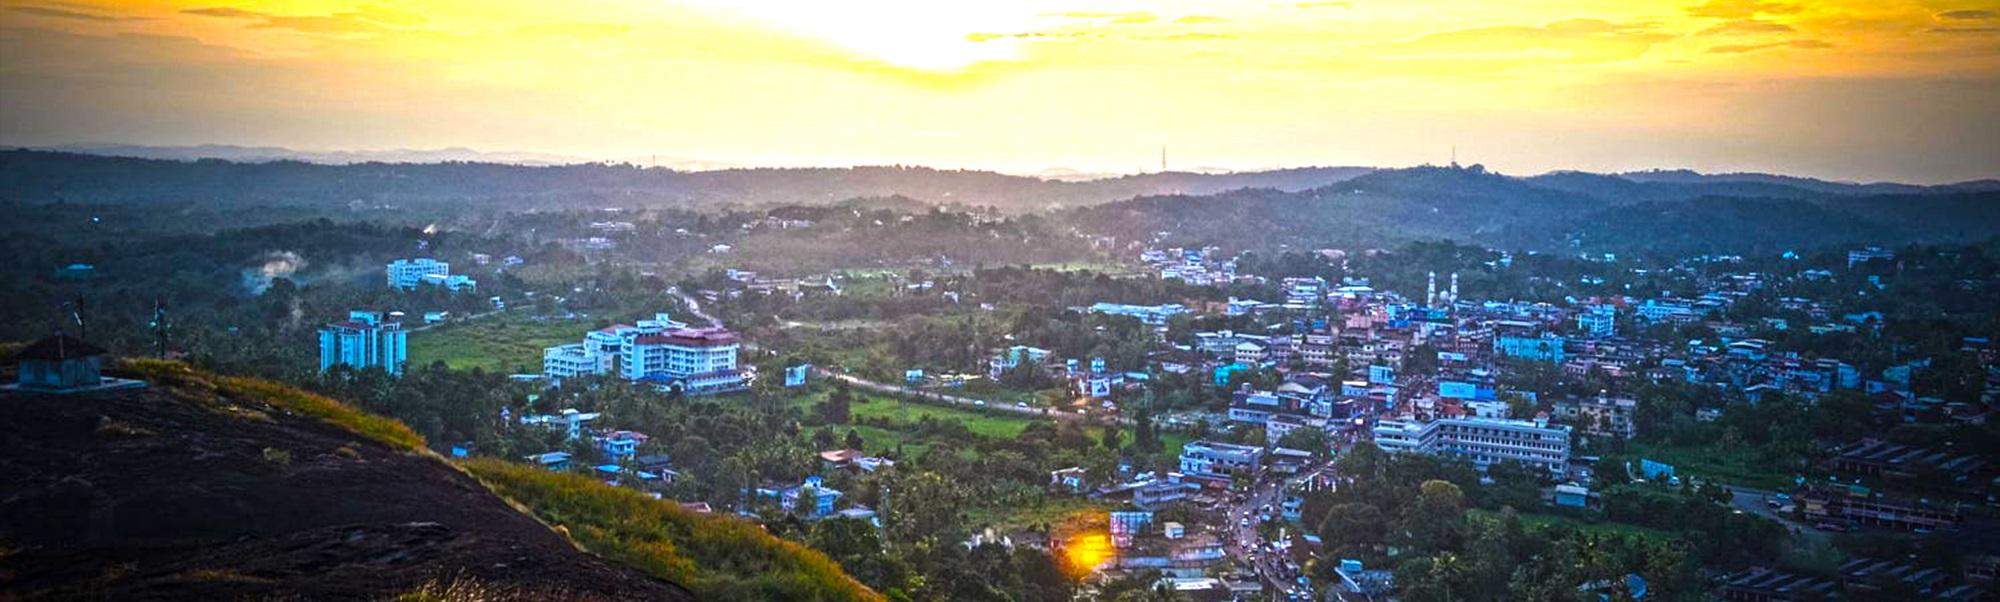 Pathanamthitta town